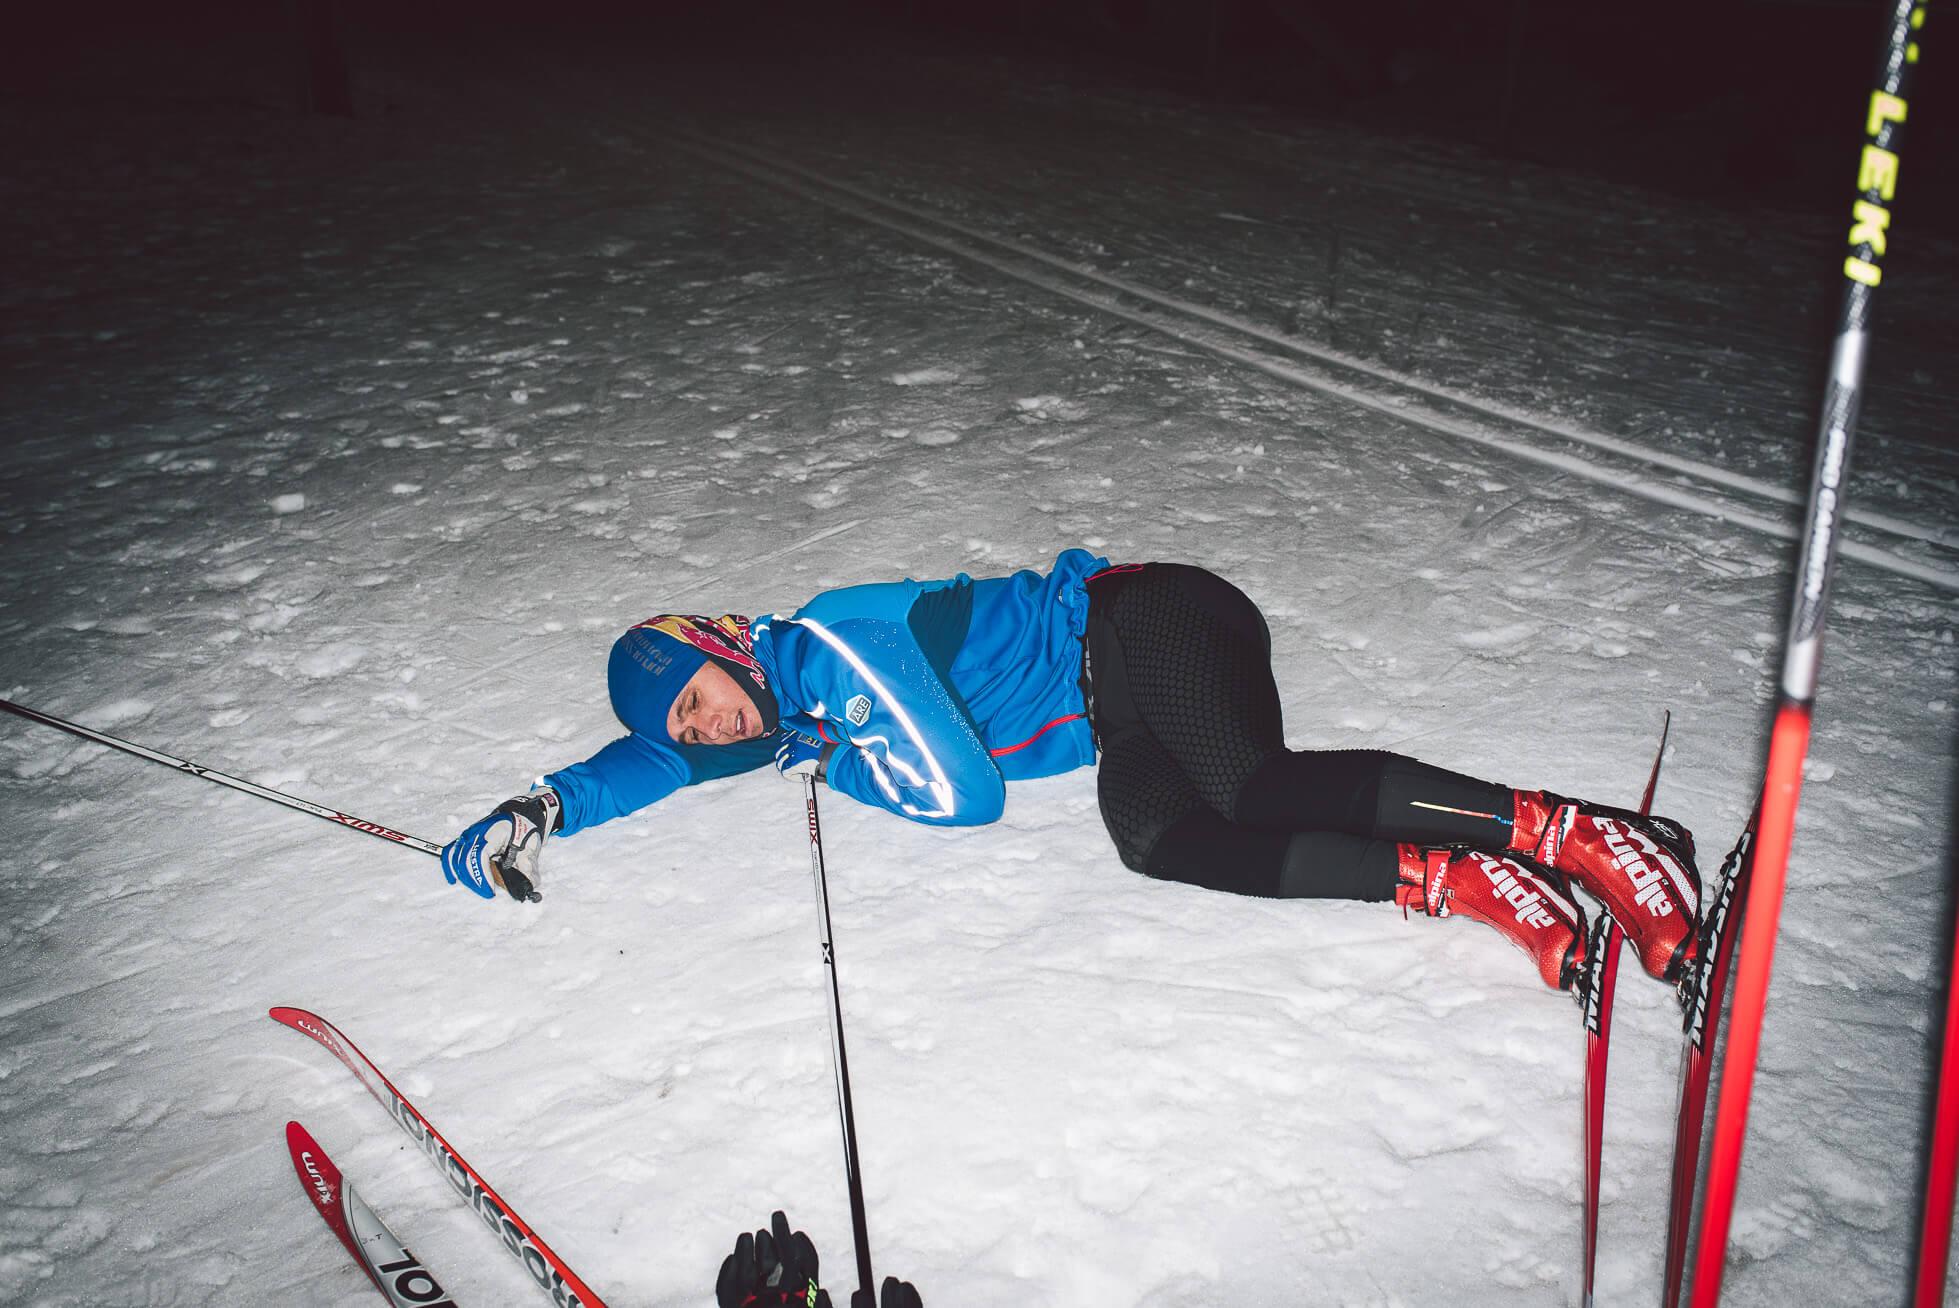 janni-deler-cross-country-skiingDSC_7895